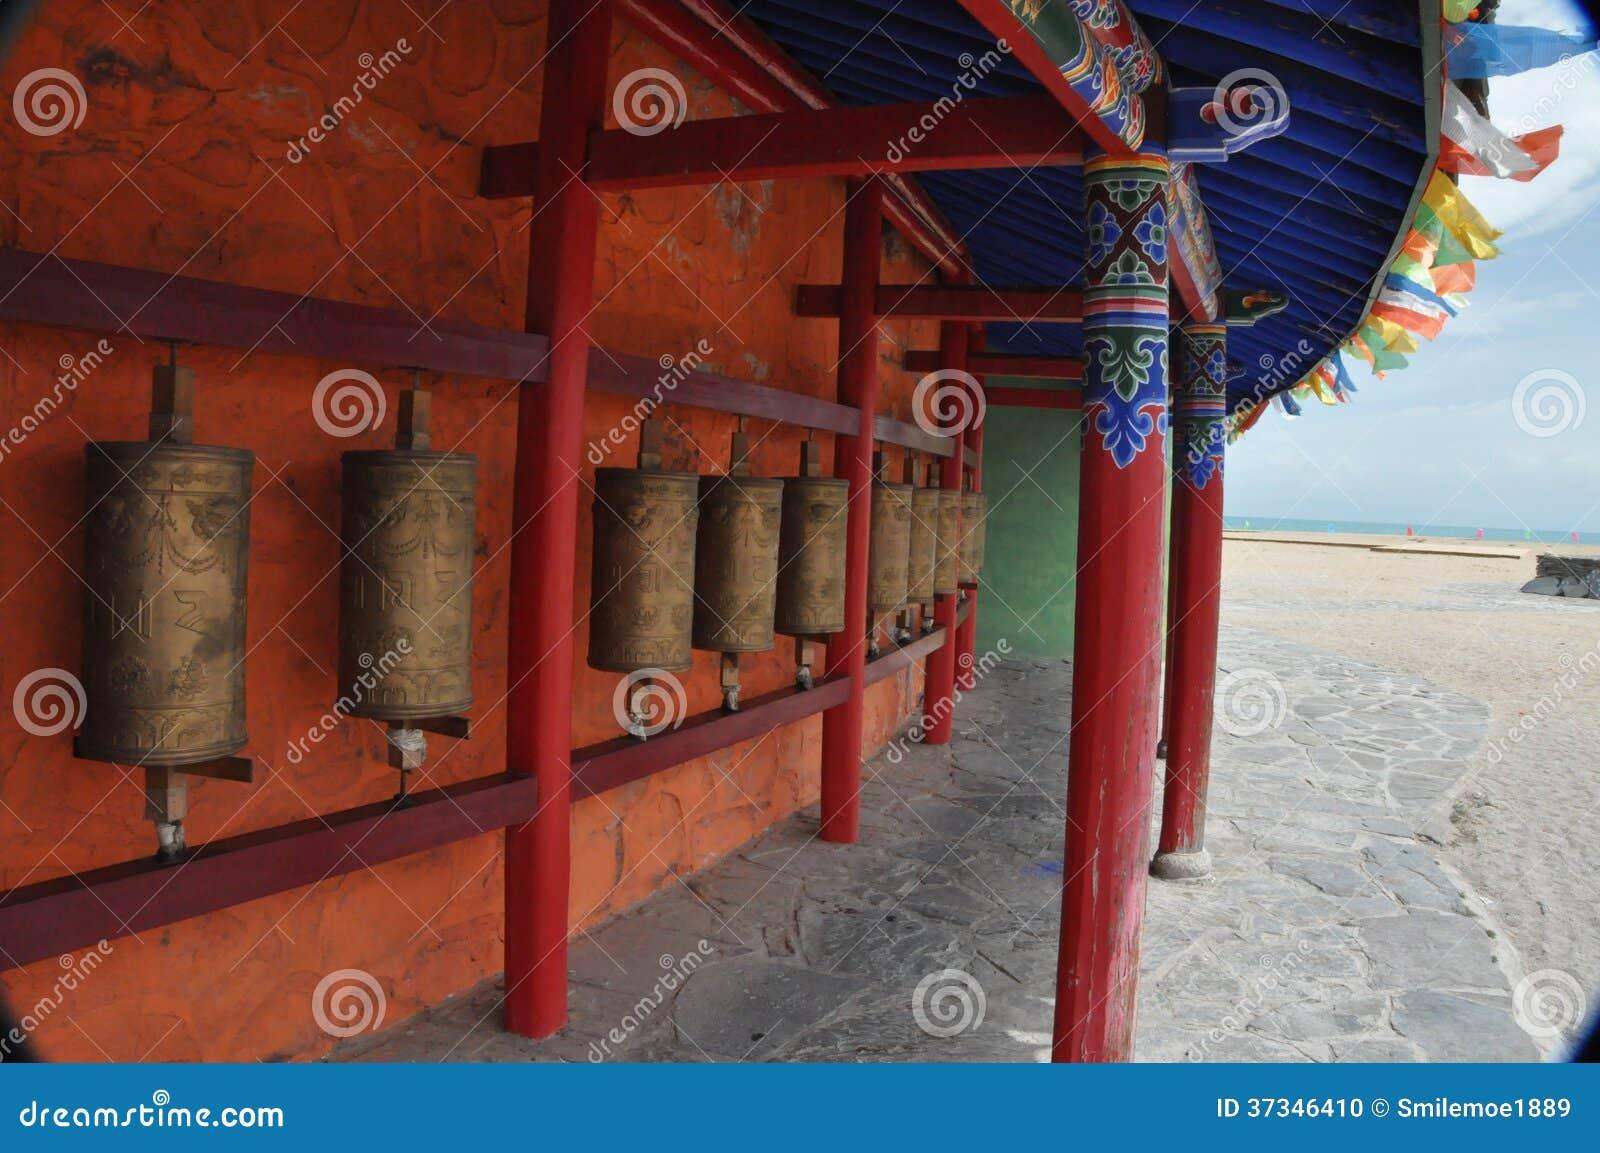 Tibet turns the barrels